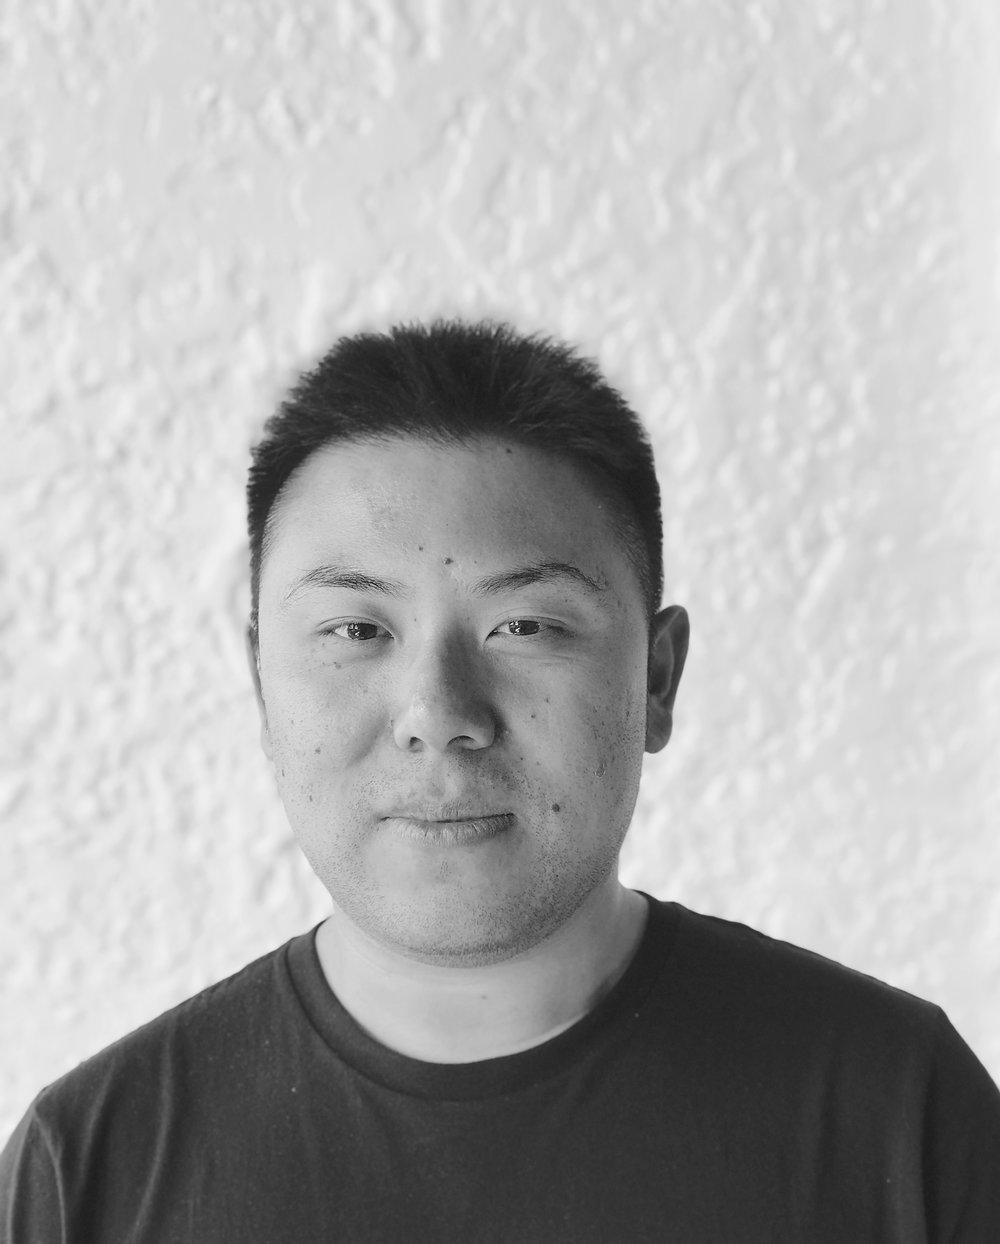 Jason Chhour - BAS / NDAT Architectural Graduate - Technician